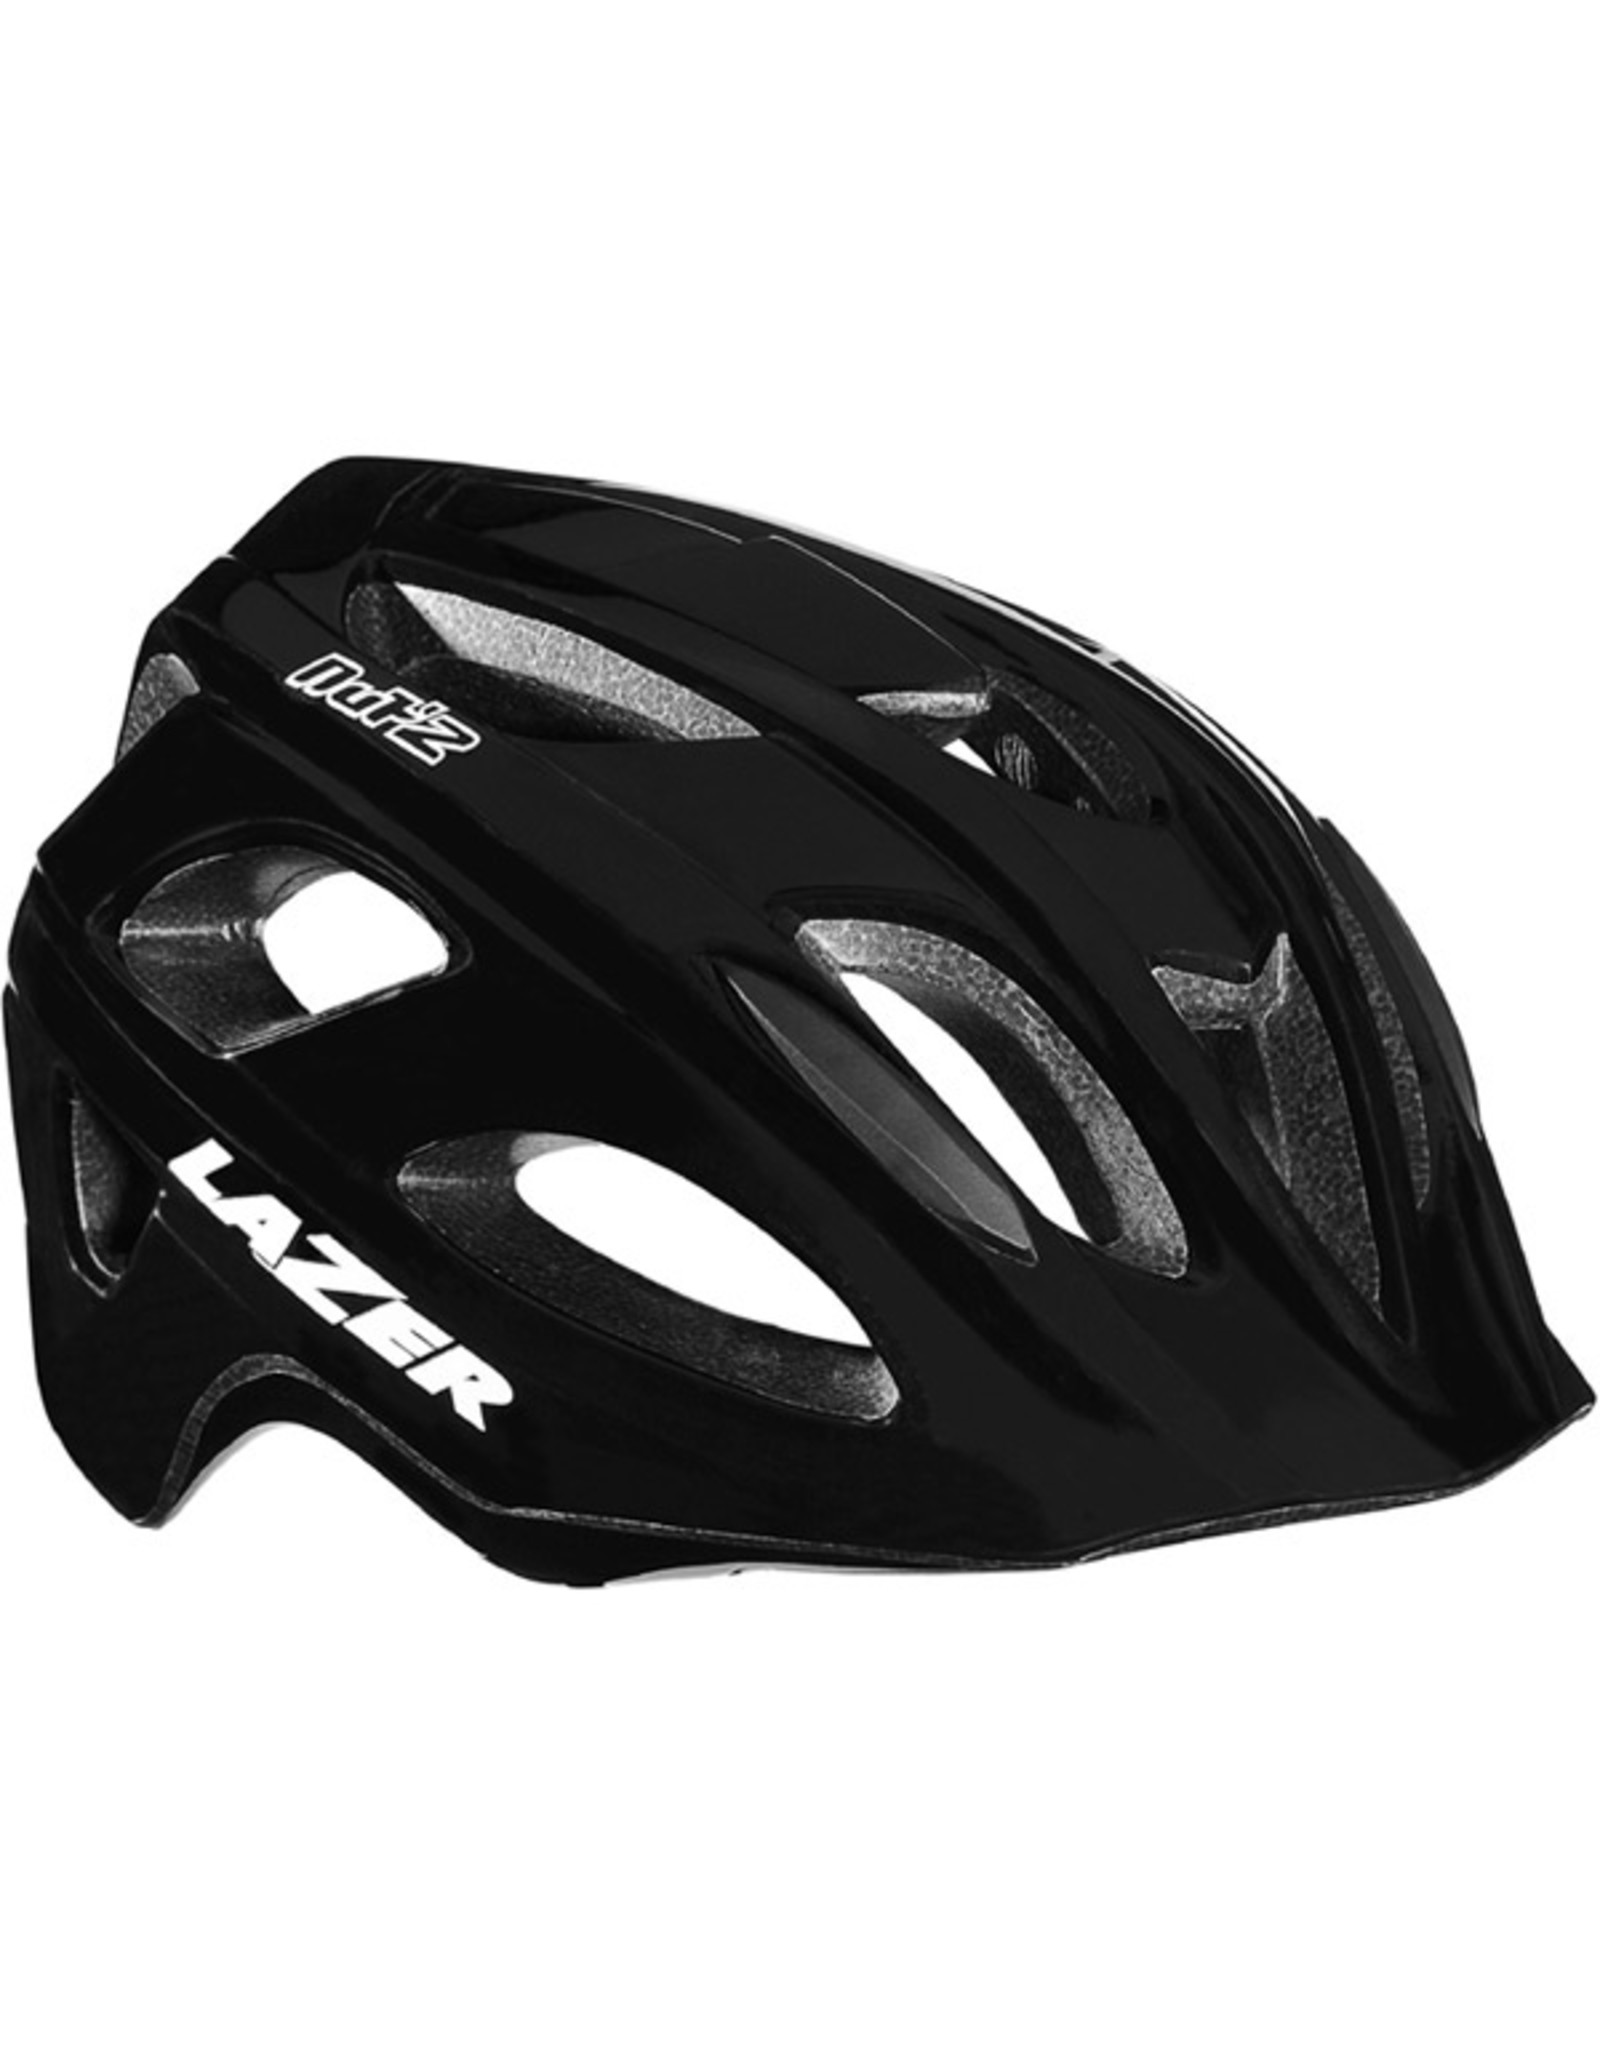 Lazer Nut'Z Helmet, Black, Uni-Youth